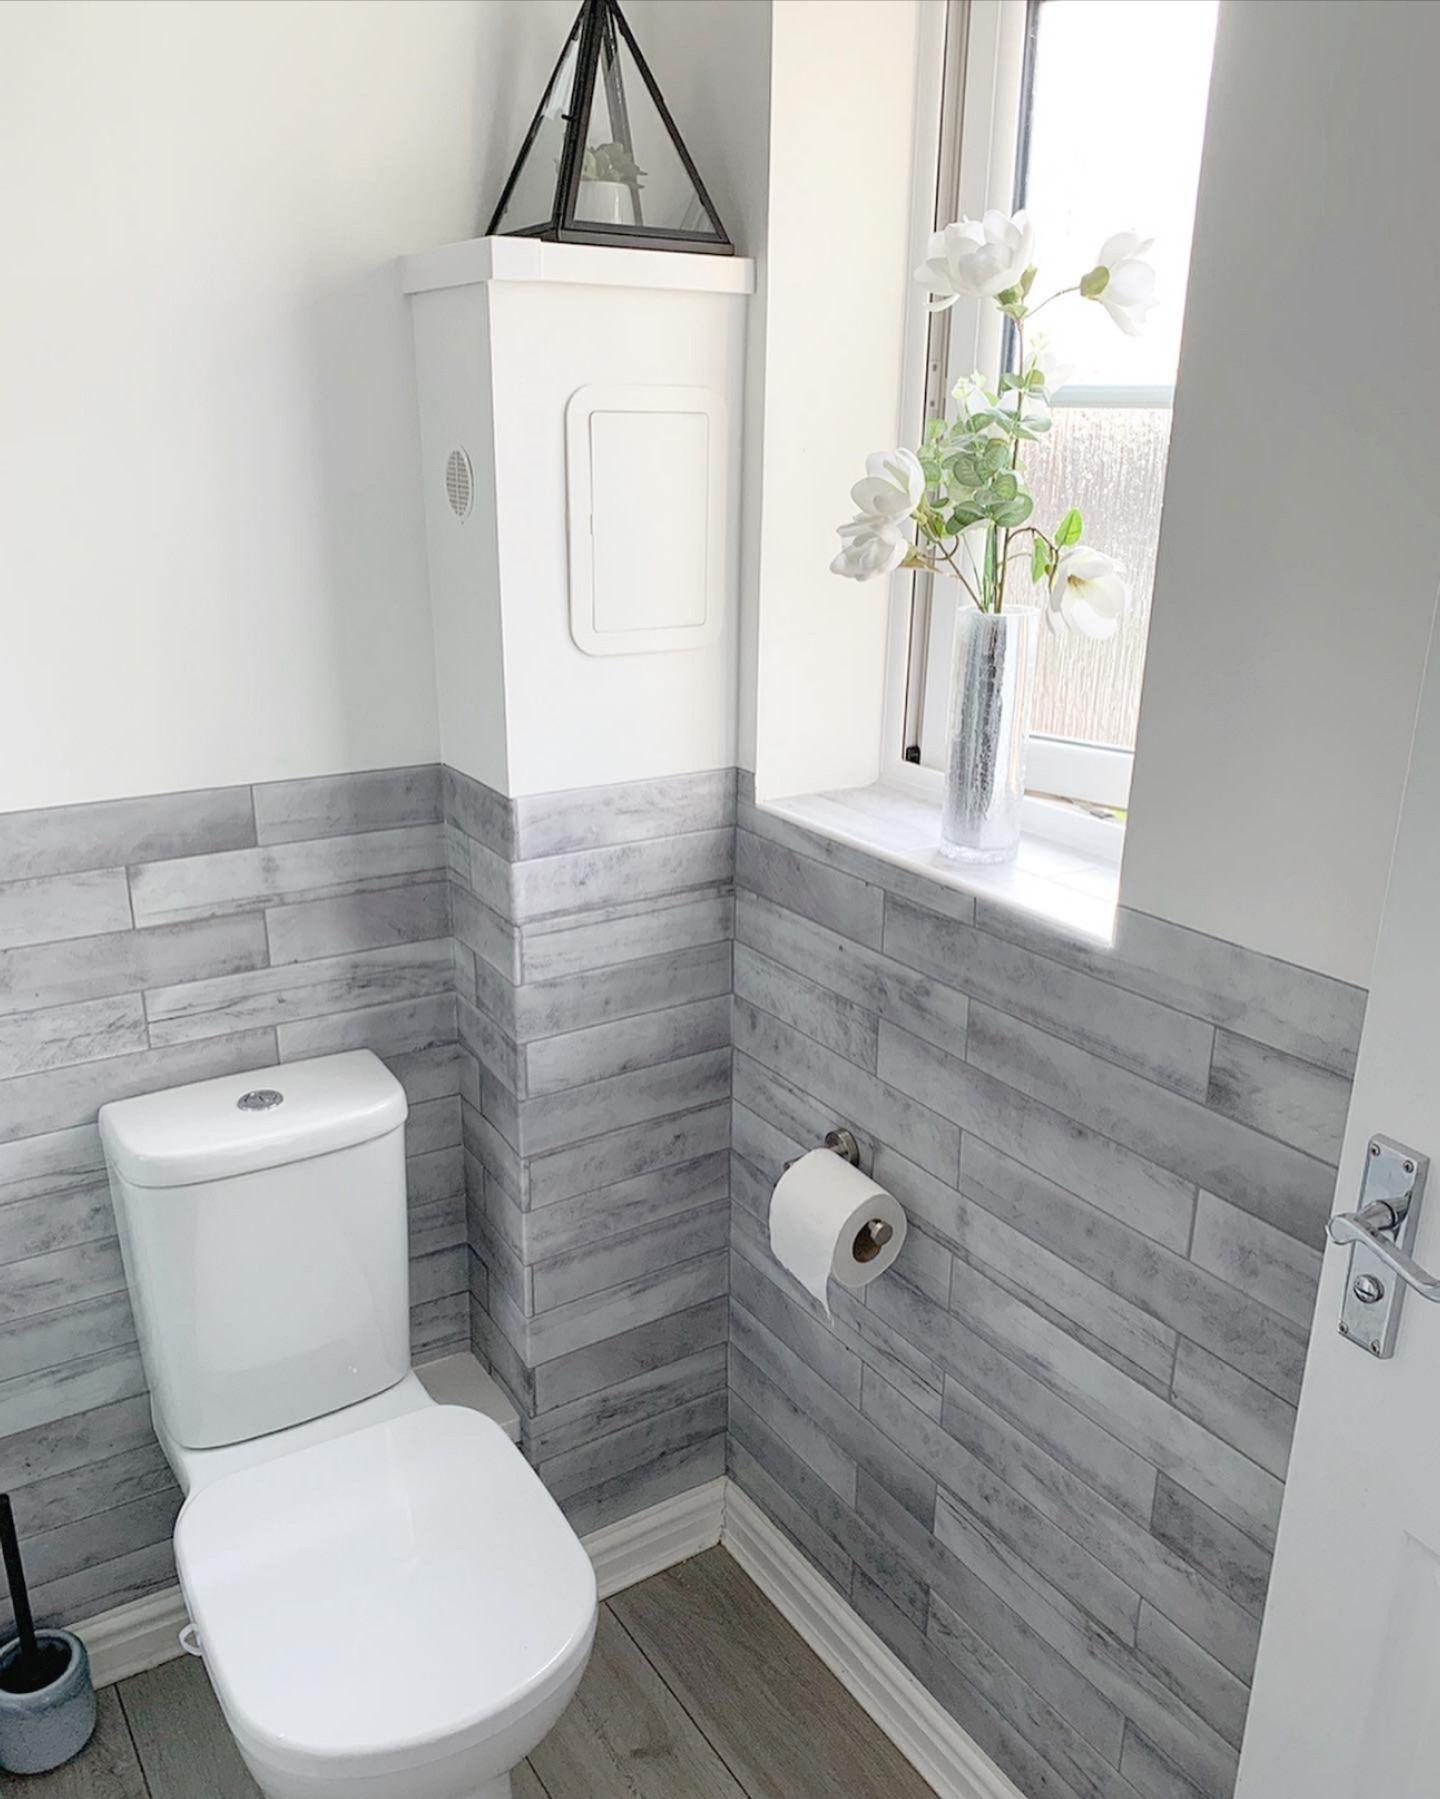 Norway Gray Maple X1 In 2020 Cheap Bathrooms Bathroom Wall Tile Tile Bathroom